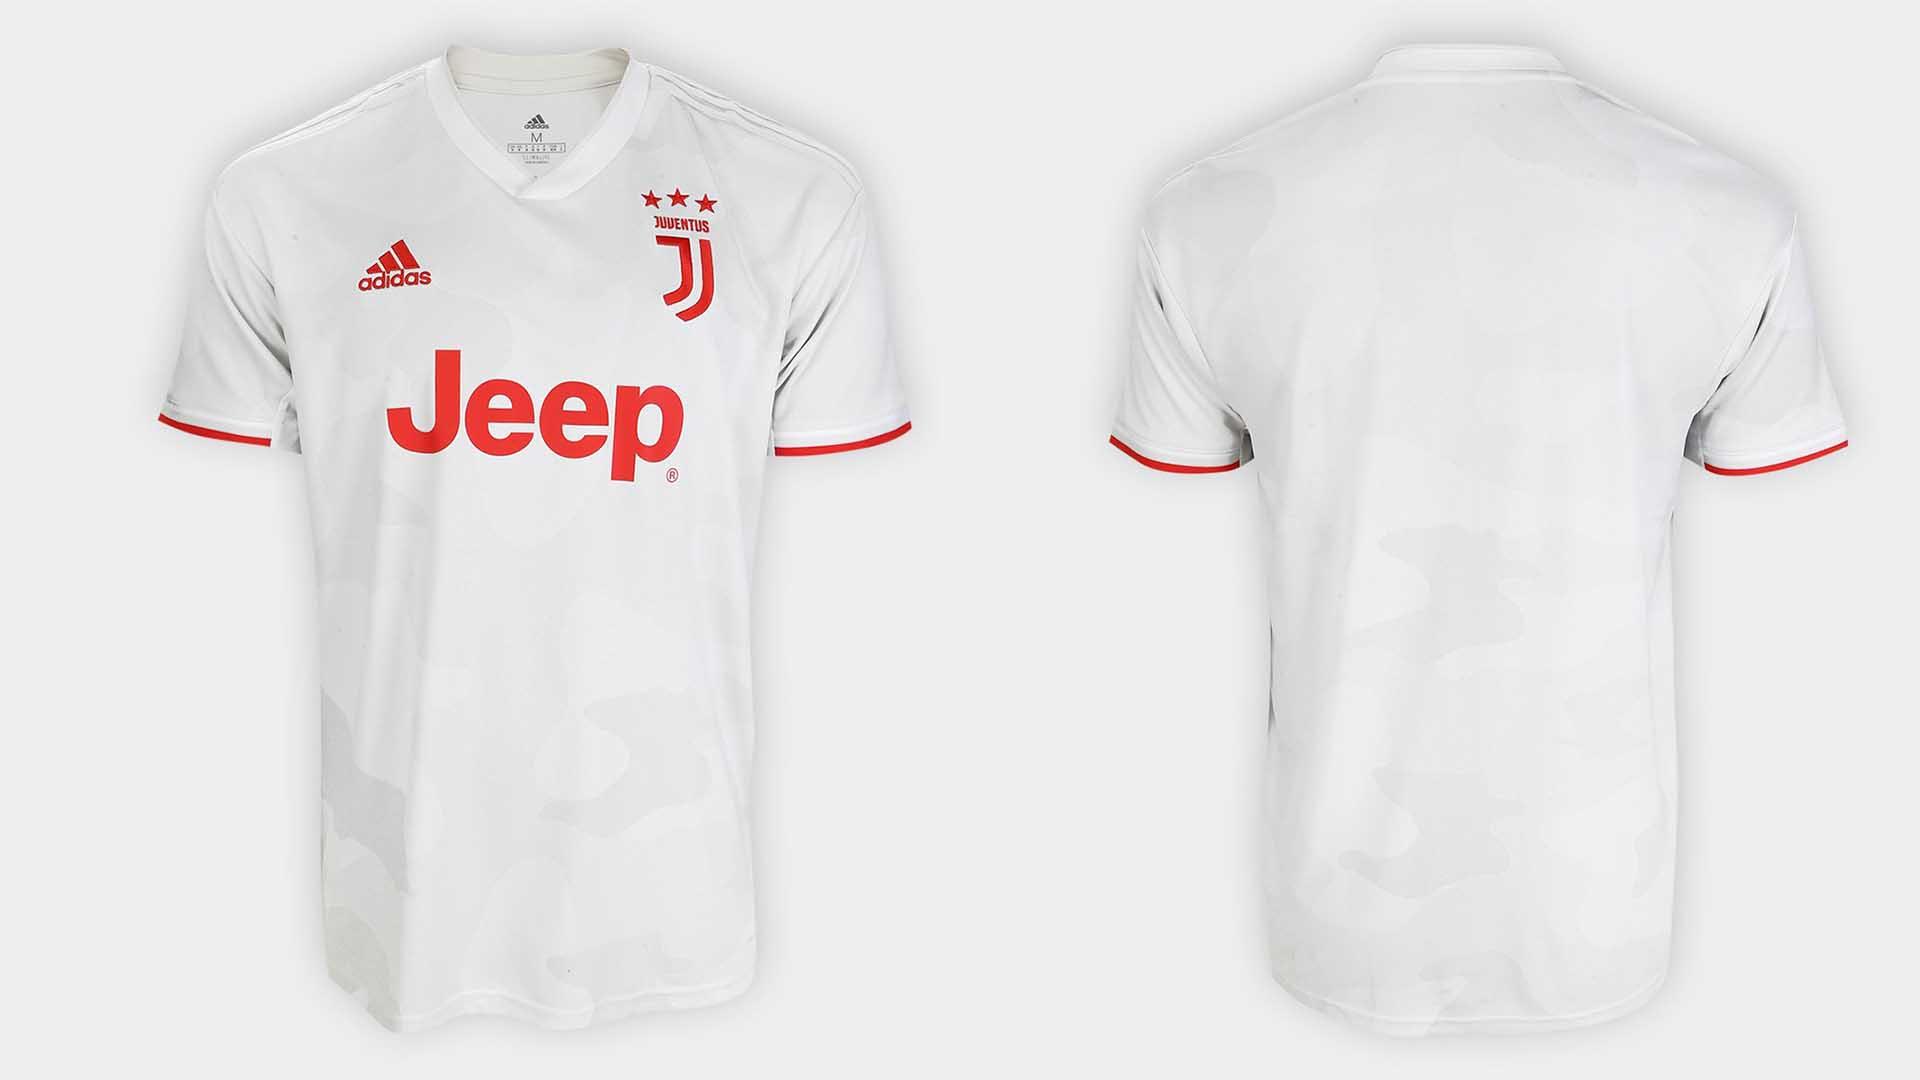 uniforme reserva juventus 2019 20